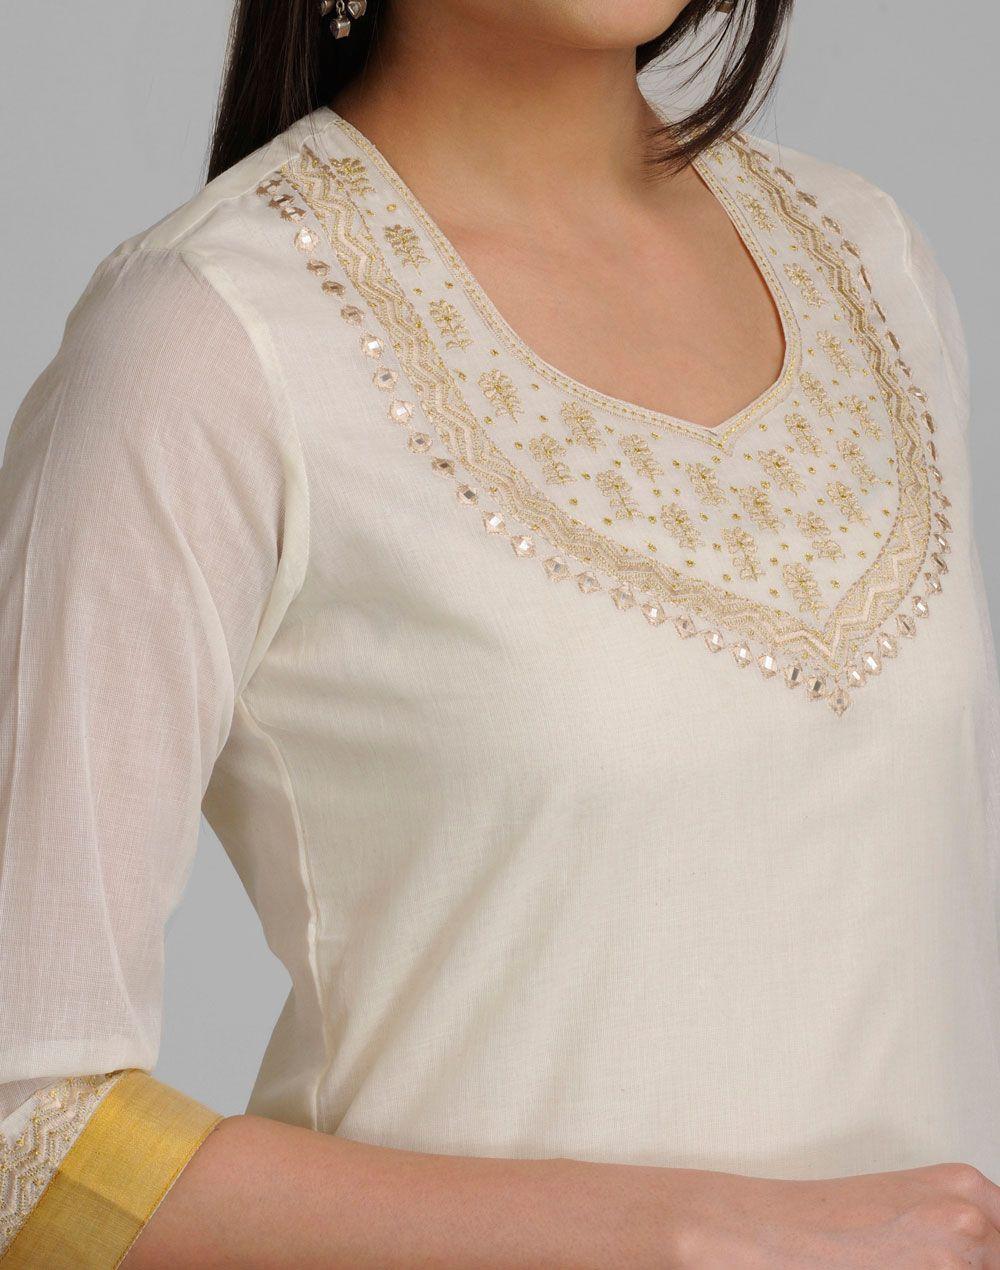 Cottonmundusweetheart neckq sleevesmodelus height neck